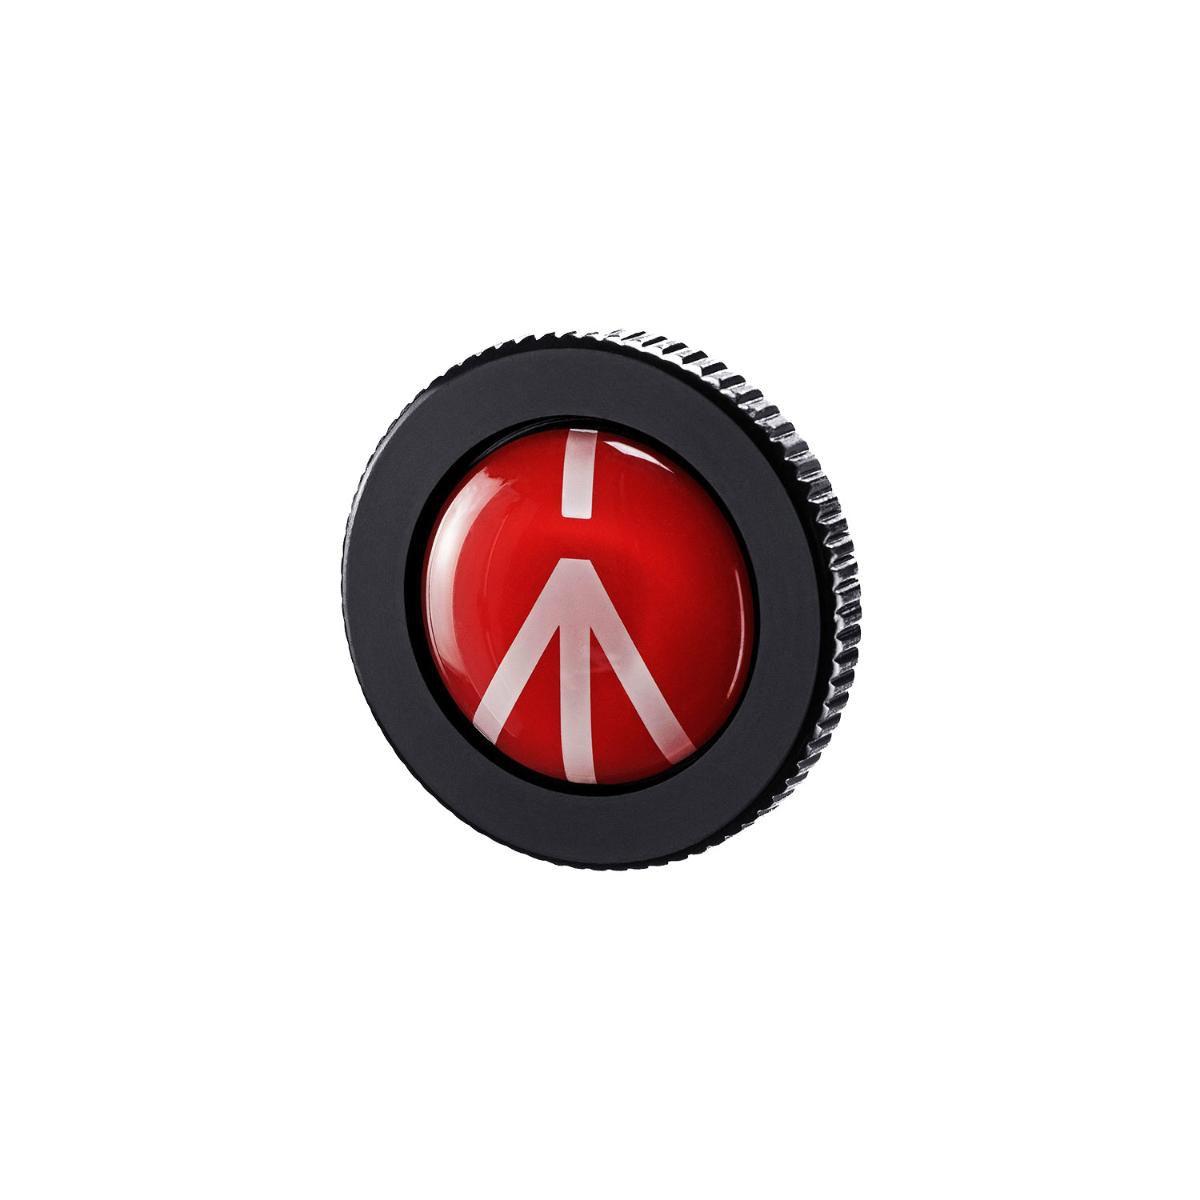 Sapata Manfrotto ROUND-PL Quick Release para Tripés Manfrotto Compact Action  - Fotolux